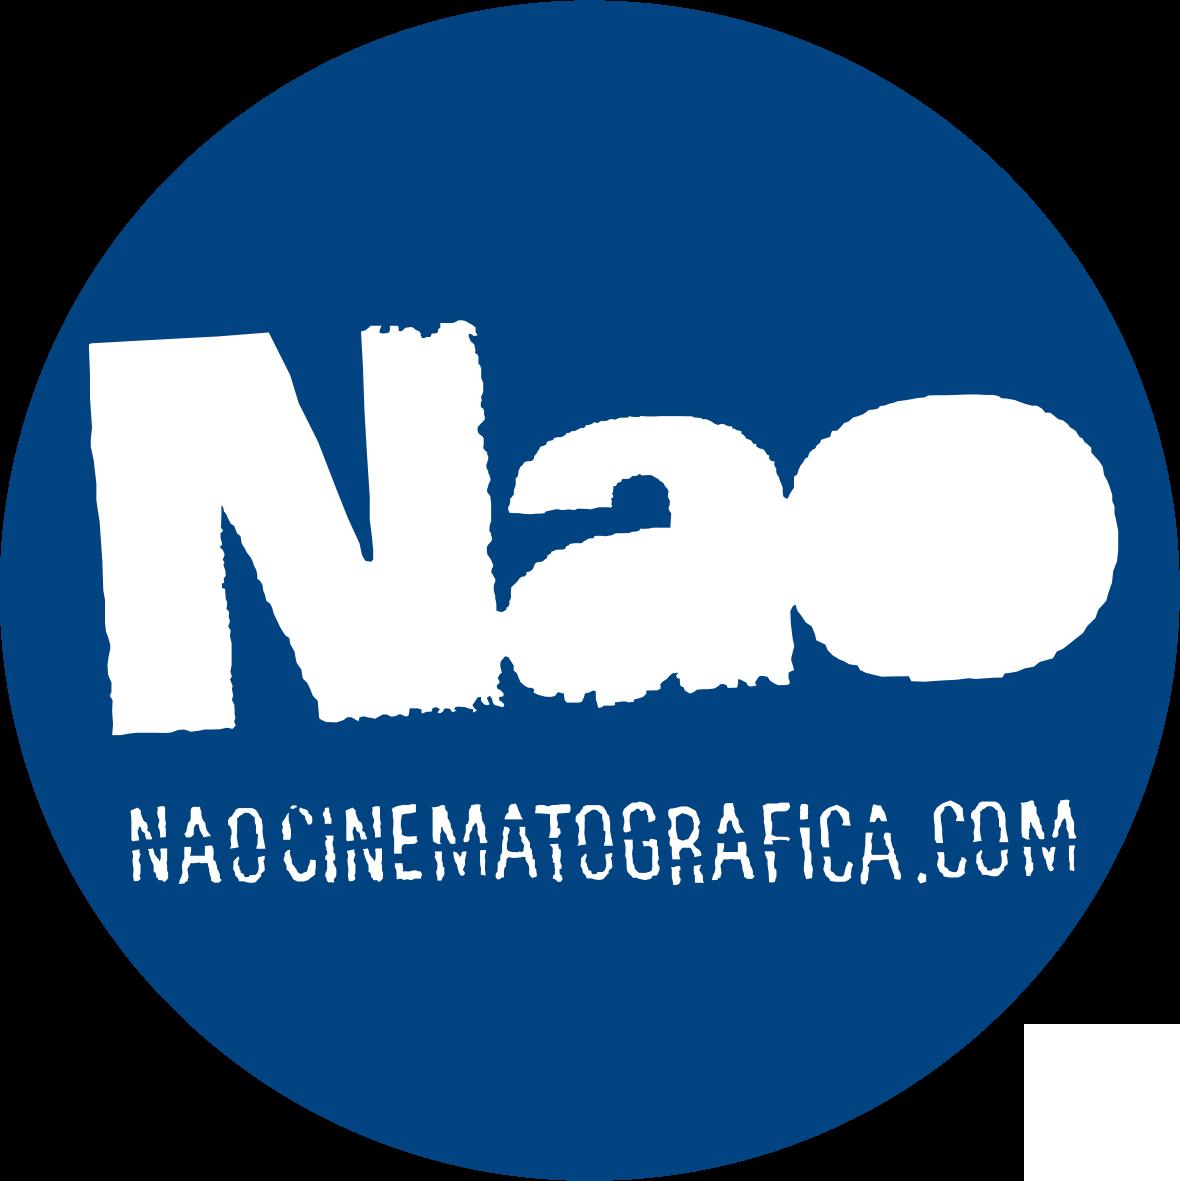 NaoCinematografica